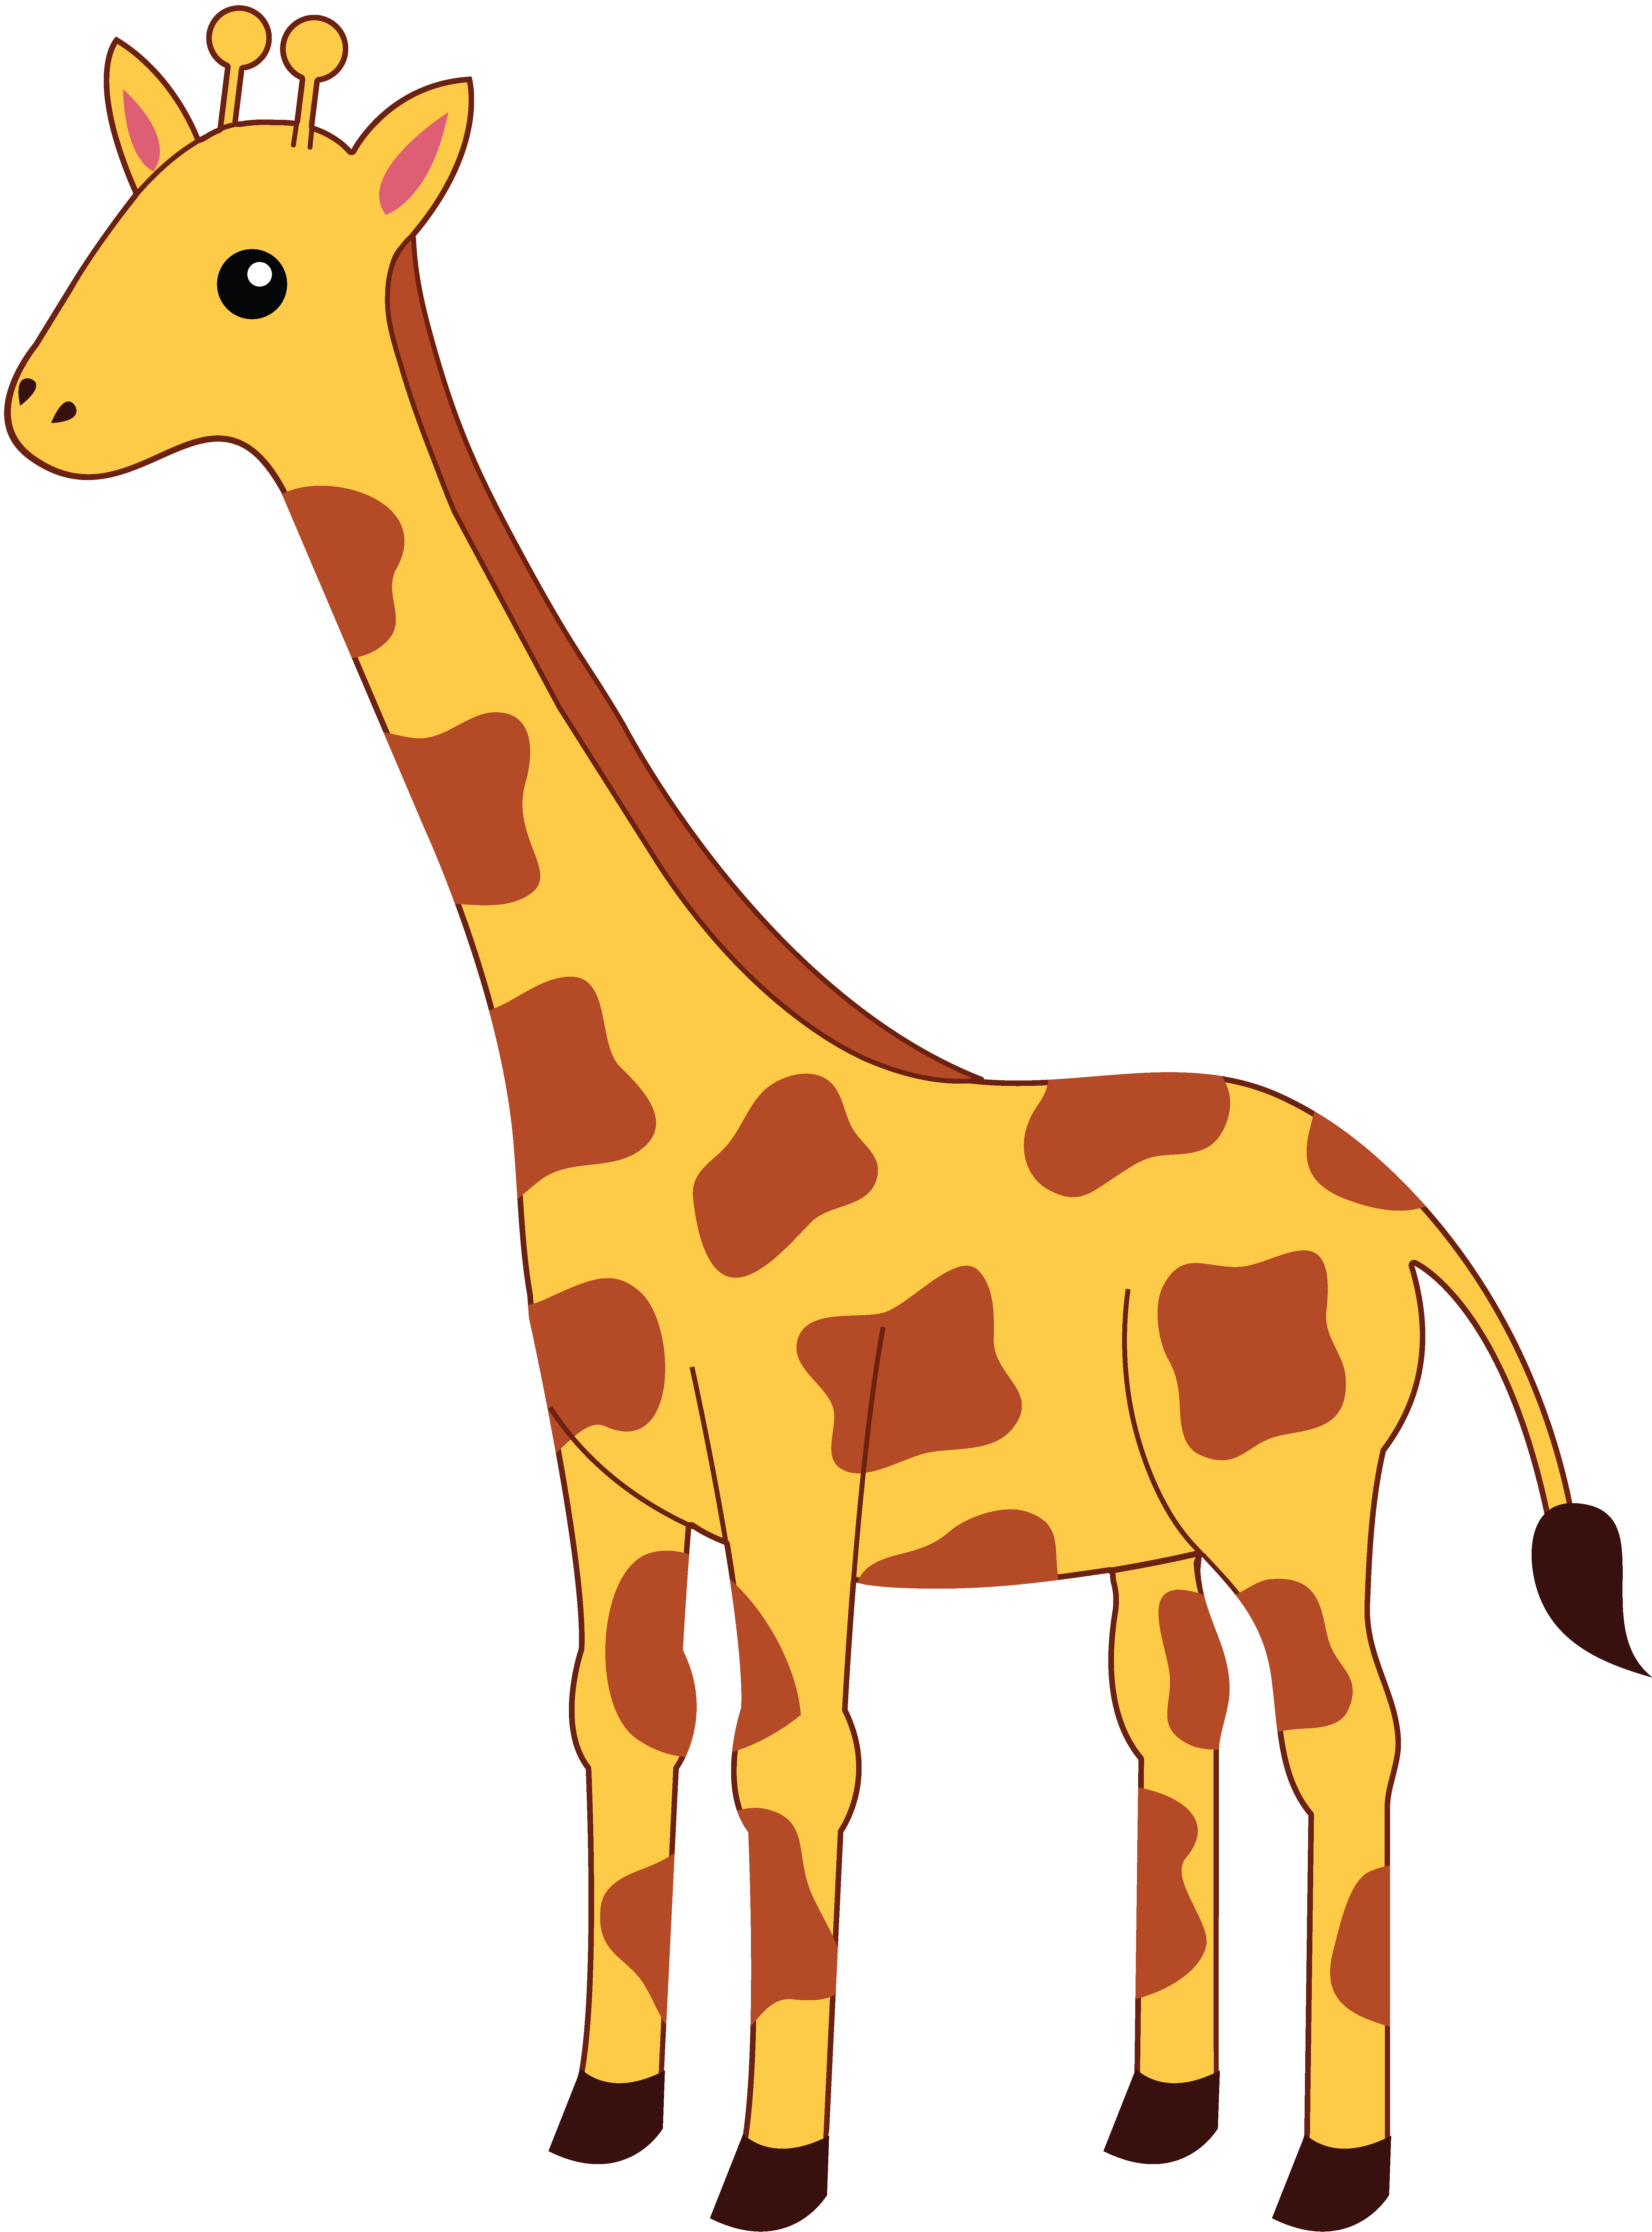 Free animated giraffe.